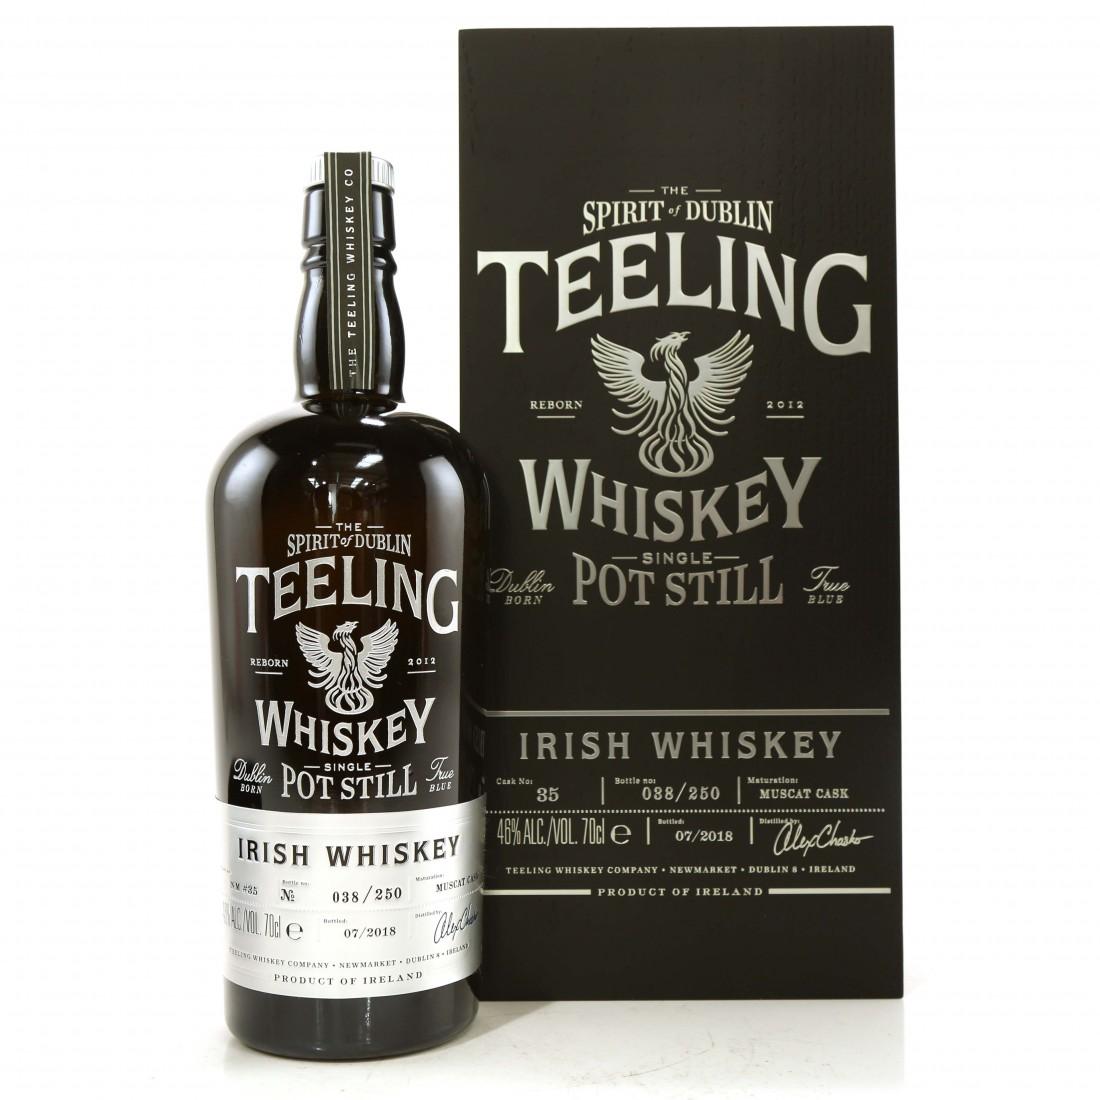 Teeling Celebratory Single Pot Still Whiskey / Bottle #038